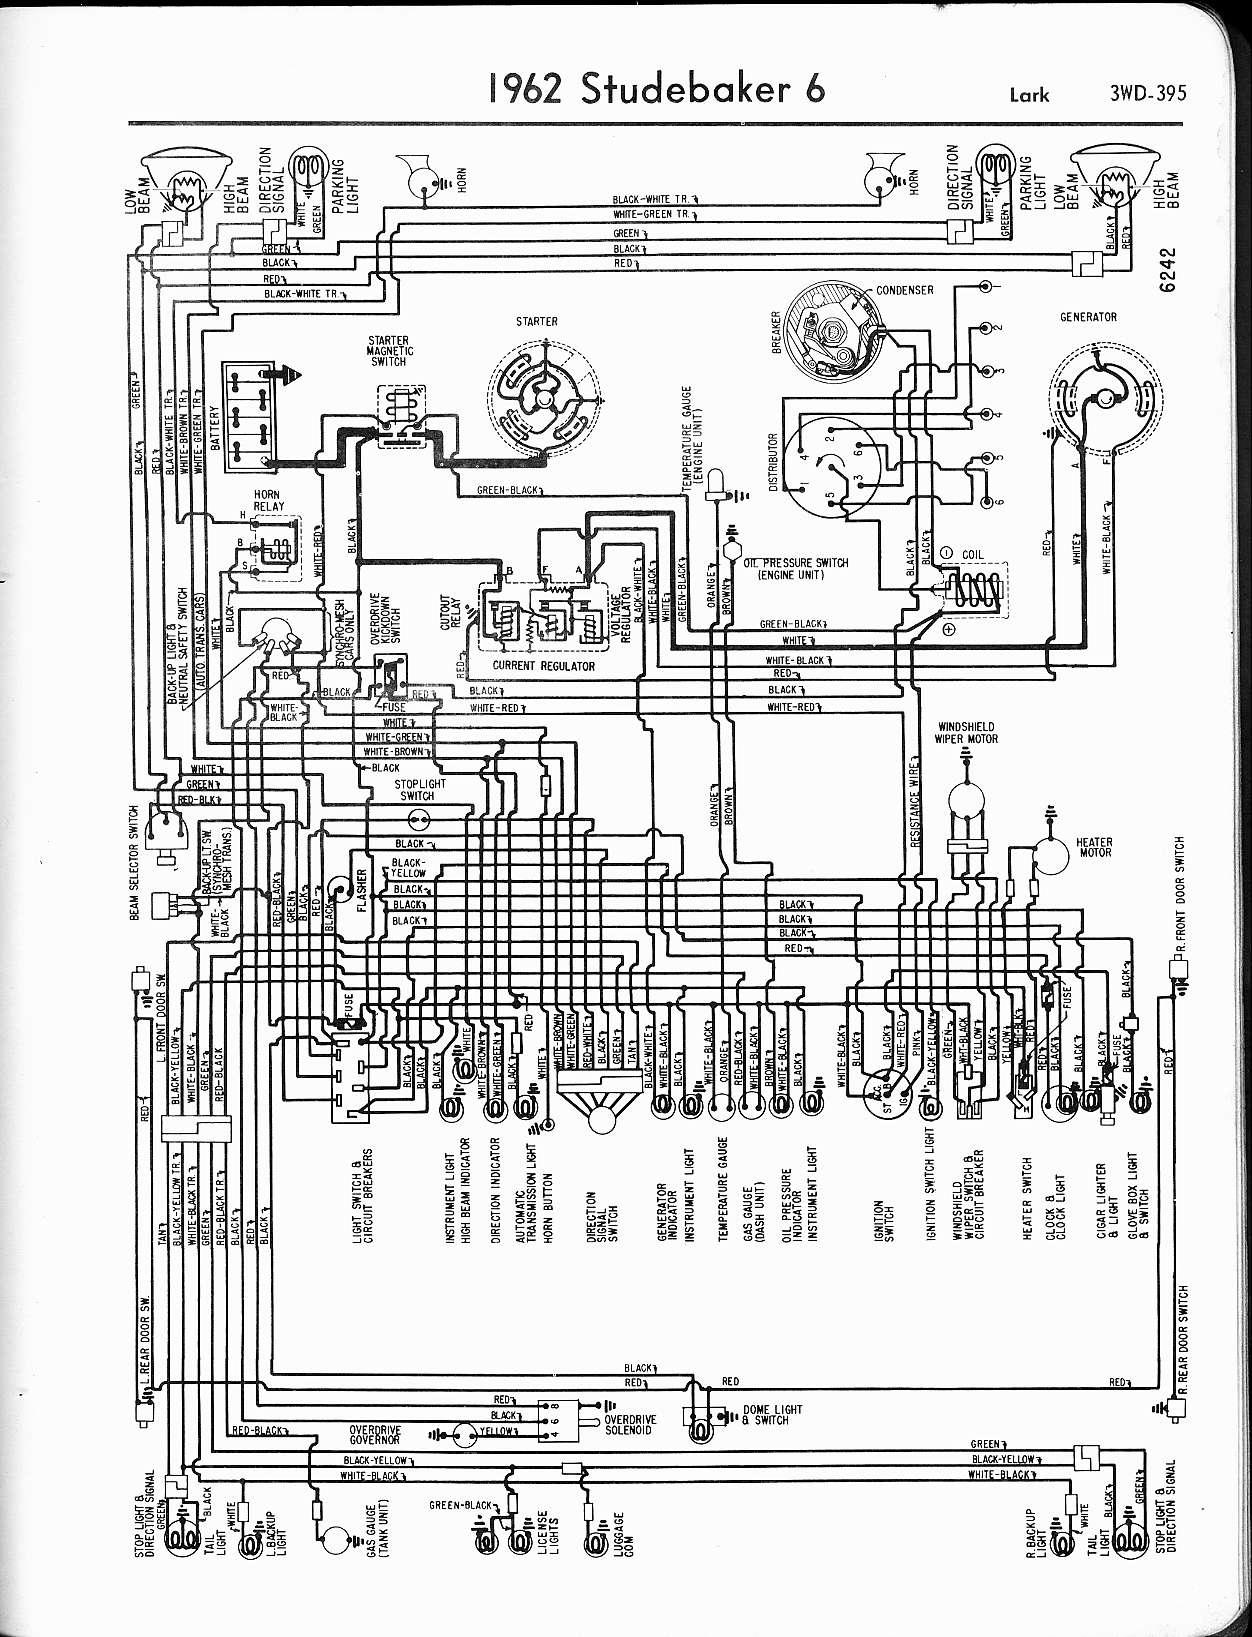 wiring diagram for 1963 64 studebaker hawk